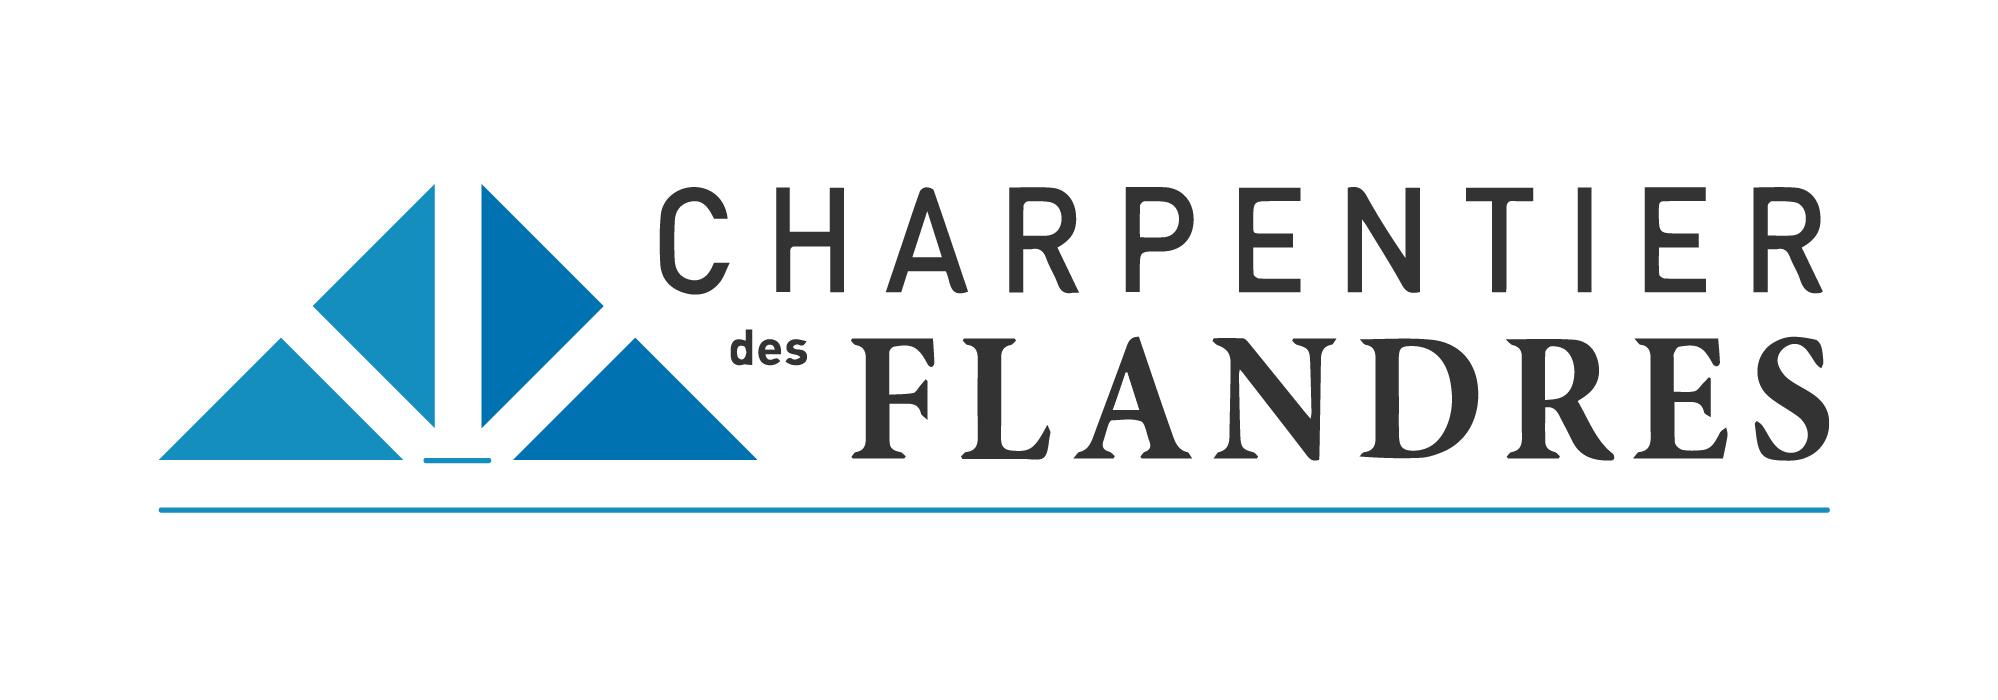 Charpentier des Flandres